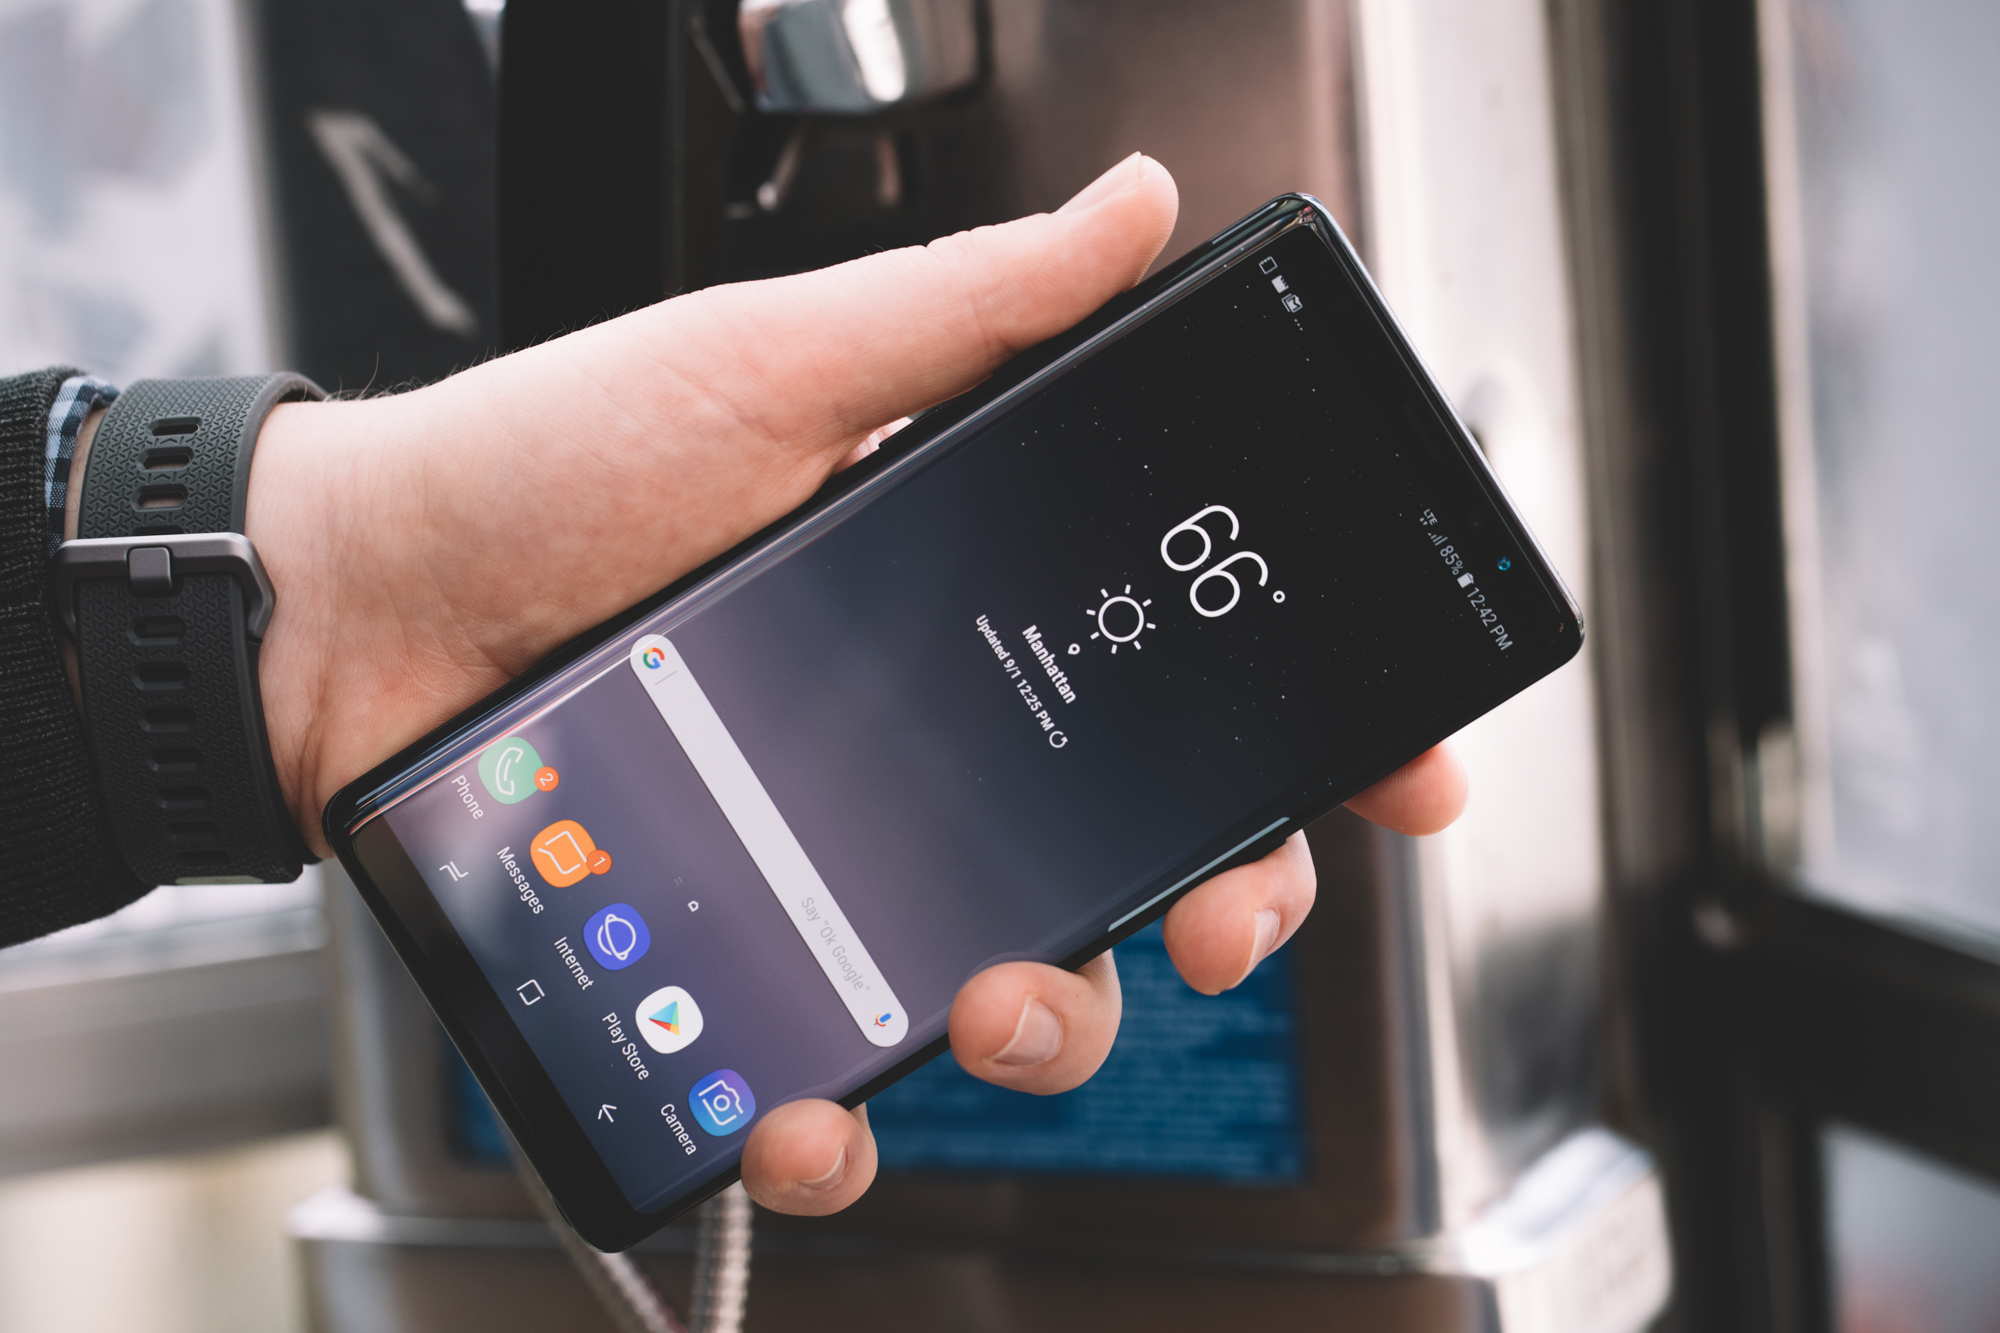 quels sont les meilleurs smartphones haut de gamme android en 2017 frandroid. Black Bedroom Furniture Sets. Home Design Ideas